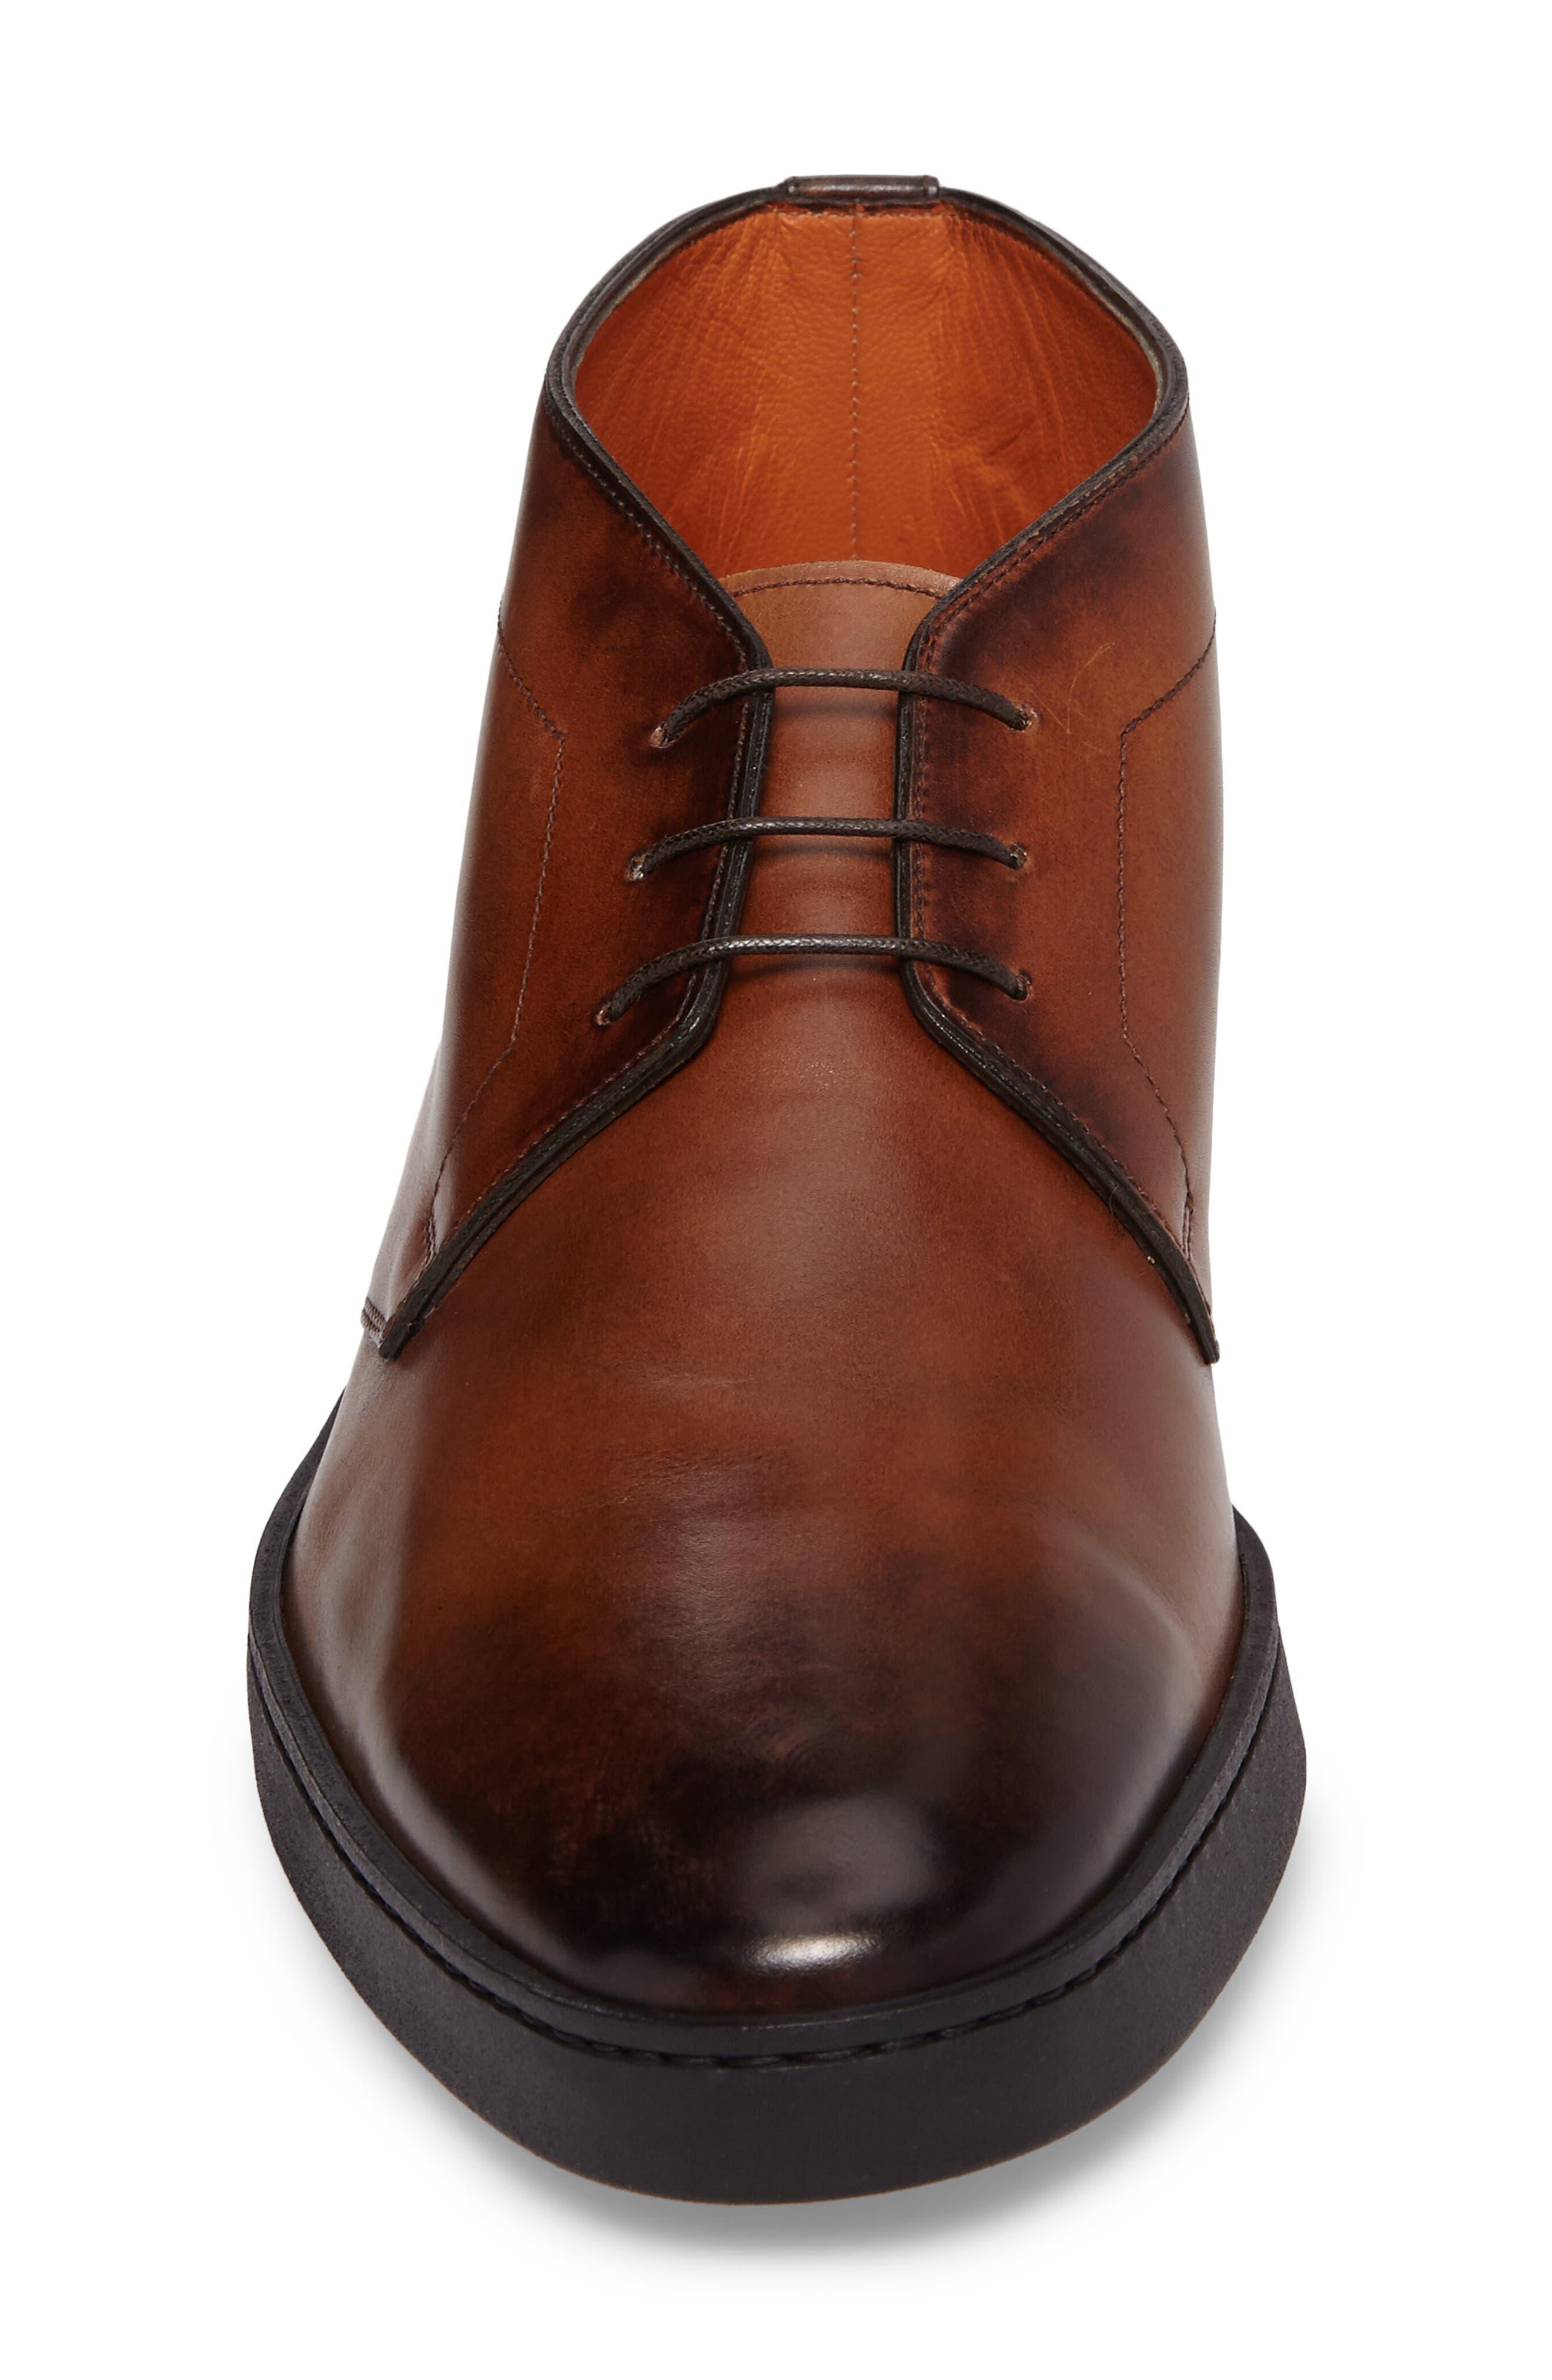 Eddy Chukka Sneaker Boot,                             Alternate thumbnail 4, color,                             BROWN